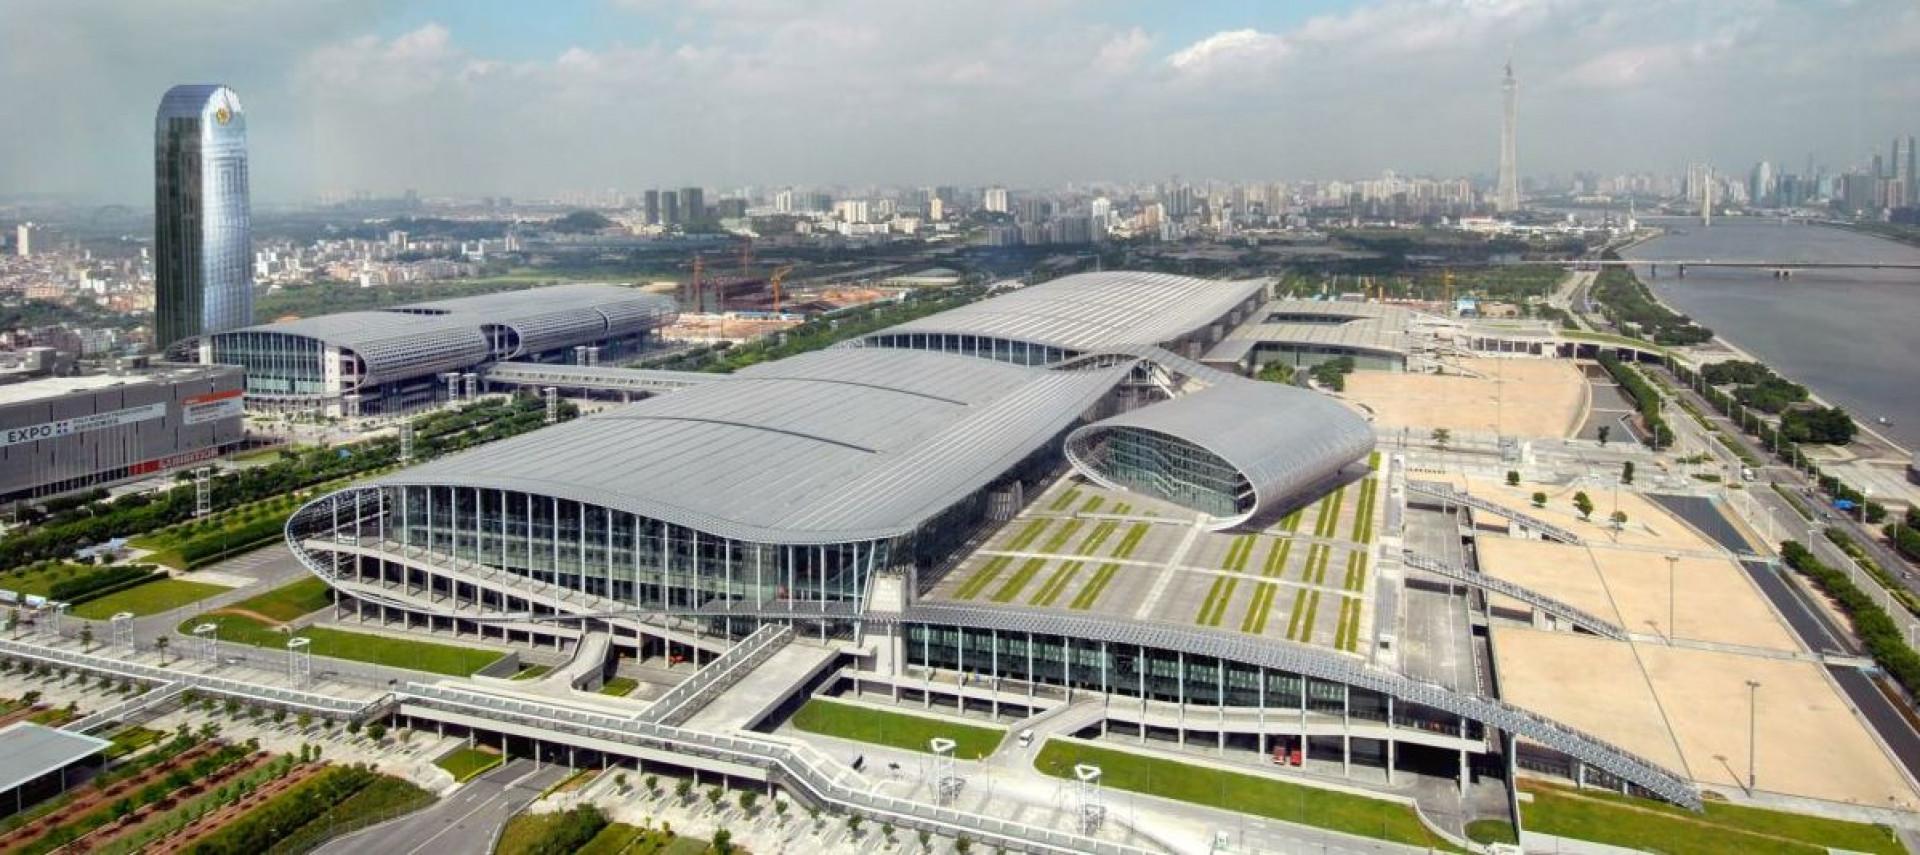 Hale wystawiennicze w Guangzhou. Fot. CIFF